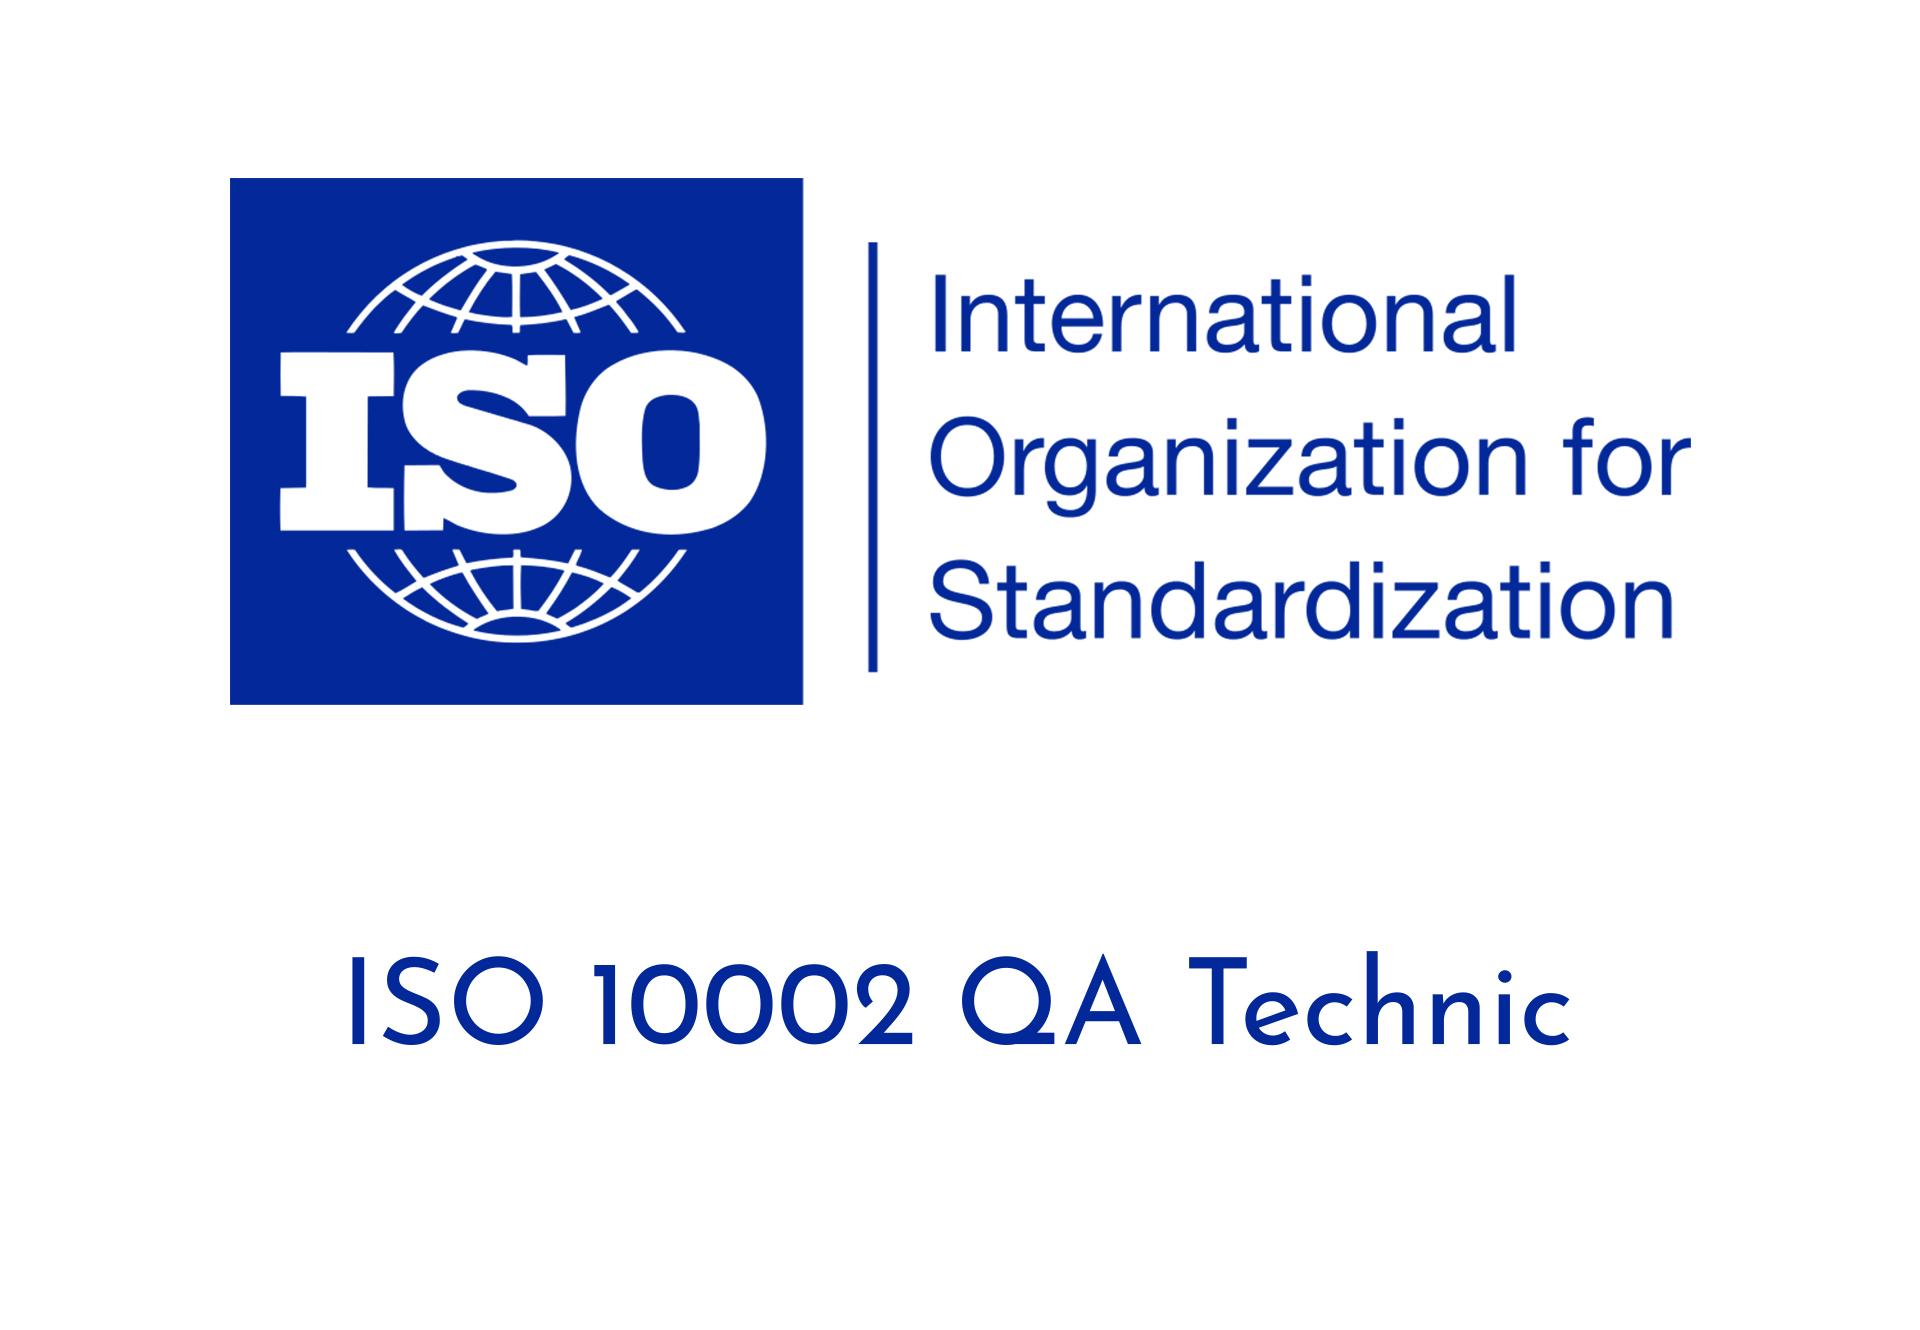 ISO 10002 QA Technic